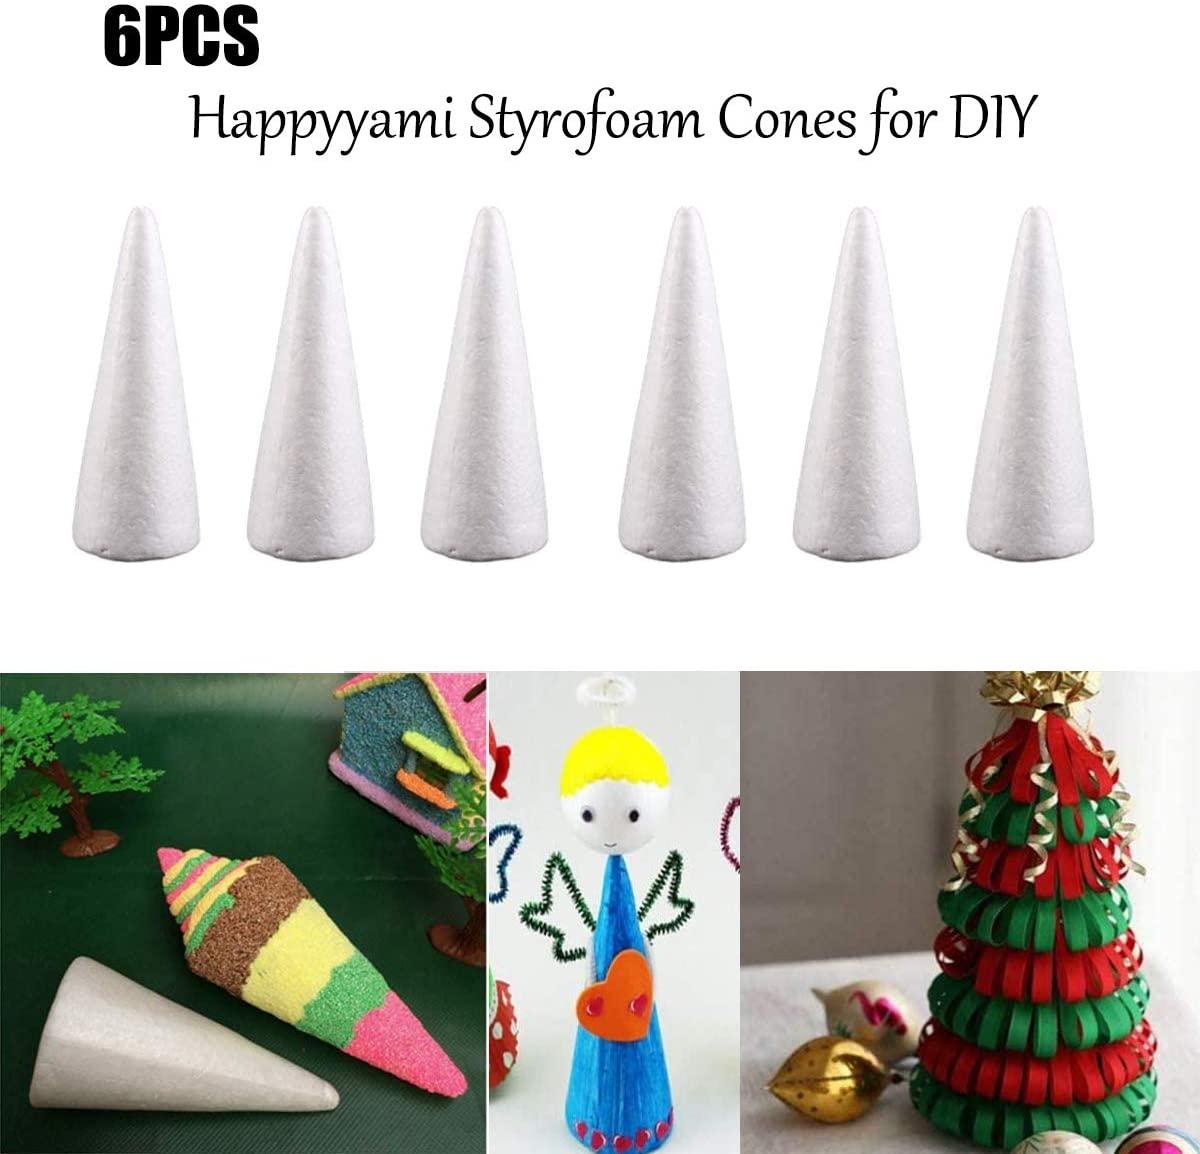 Happyyami 6pcs Craft Foam Cone White Styrofoam Cones for DIY Home Craft Project Christmas Tree Table Centerpiece 24CM